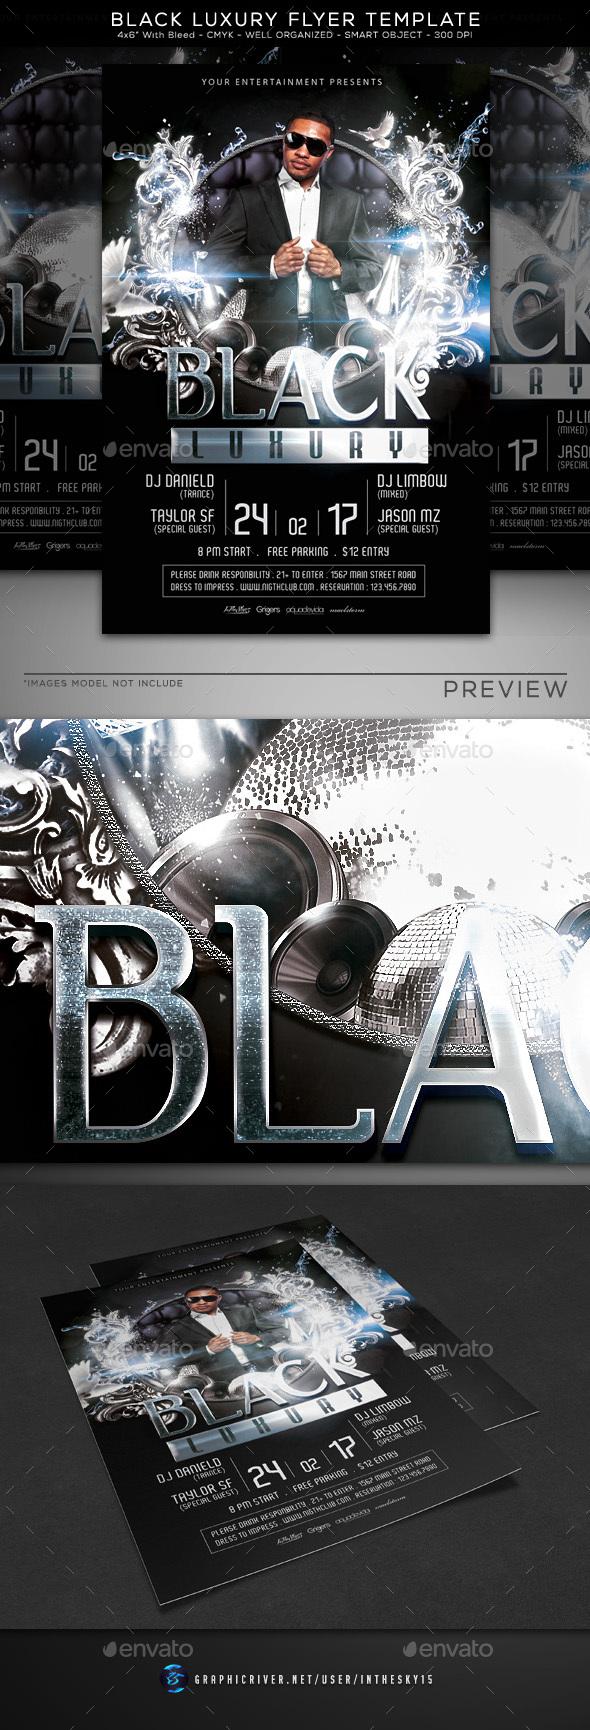 Black Luxury Flyer Template - Flyers Print Templates